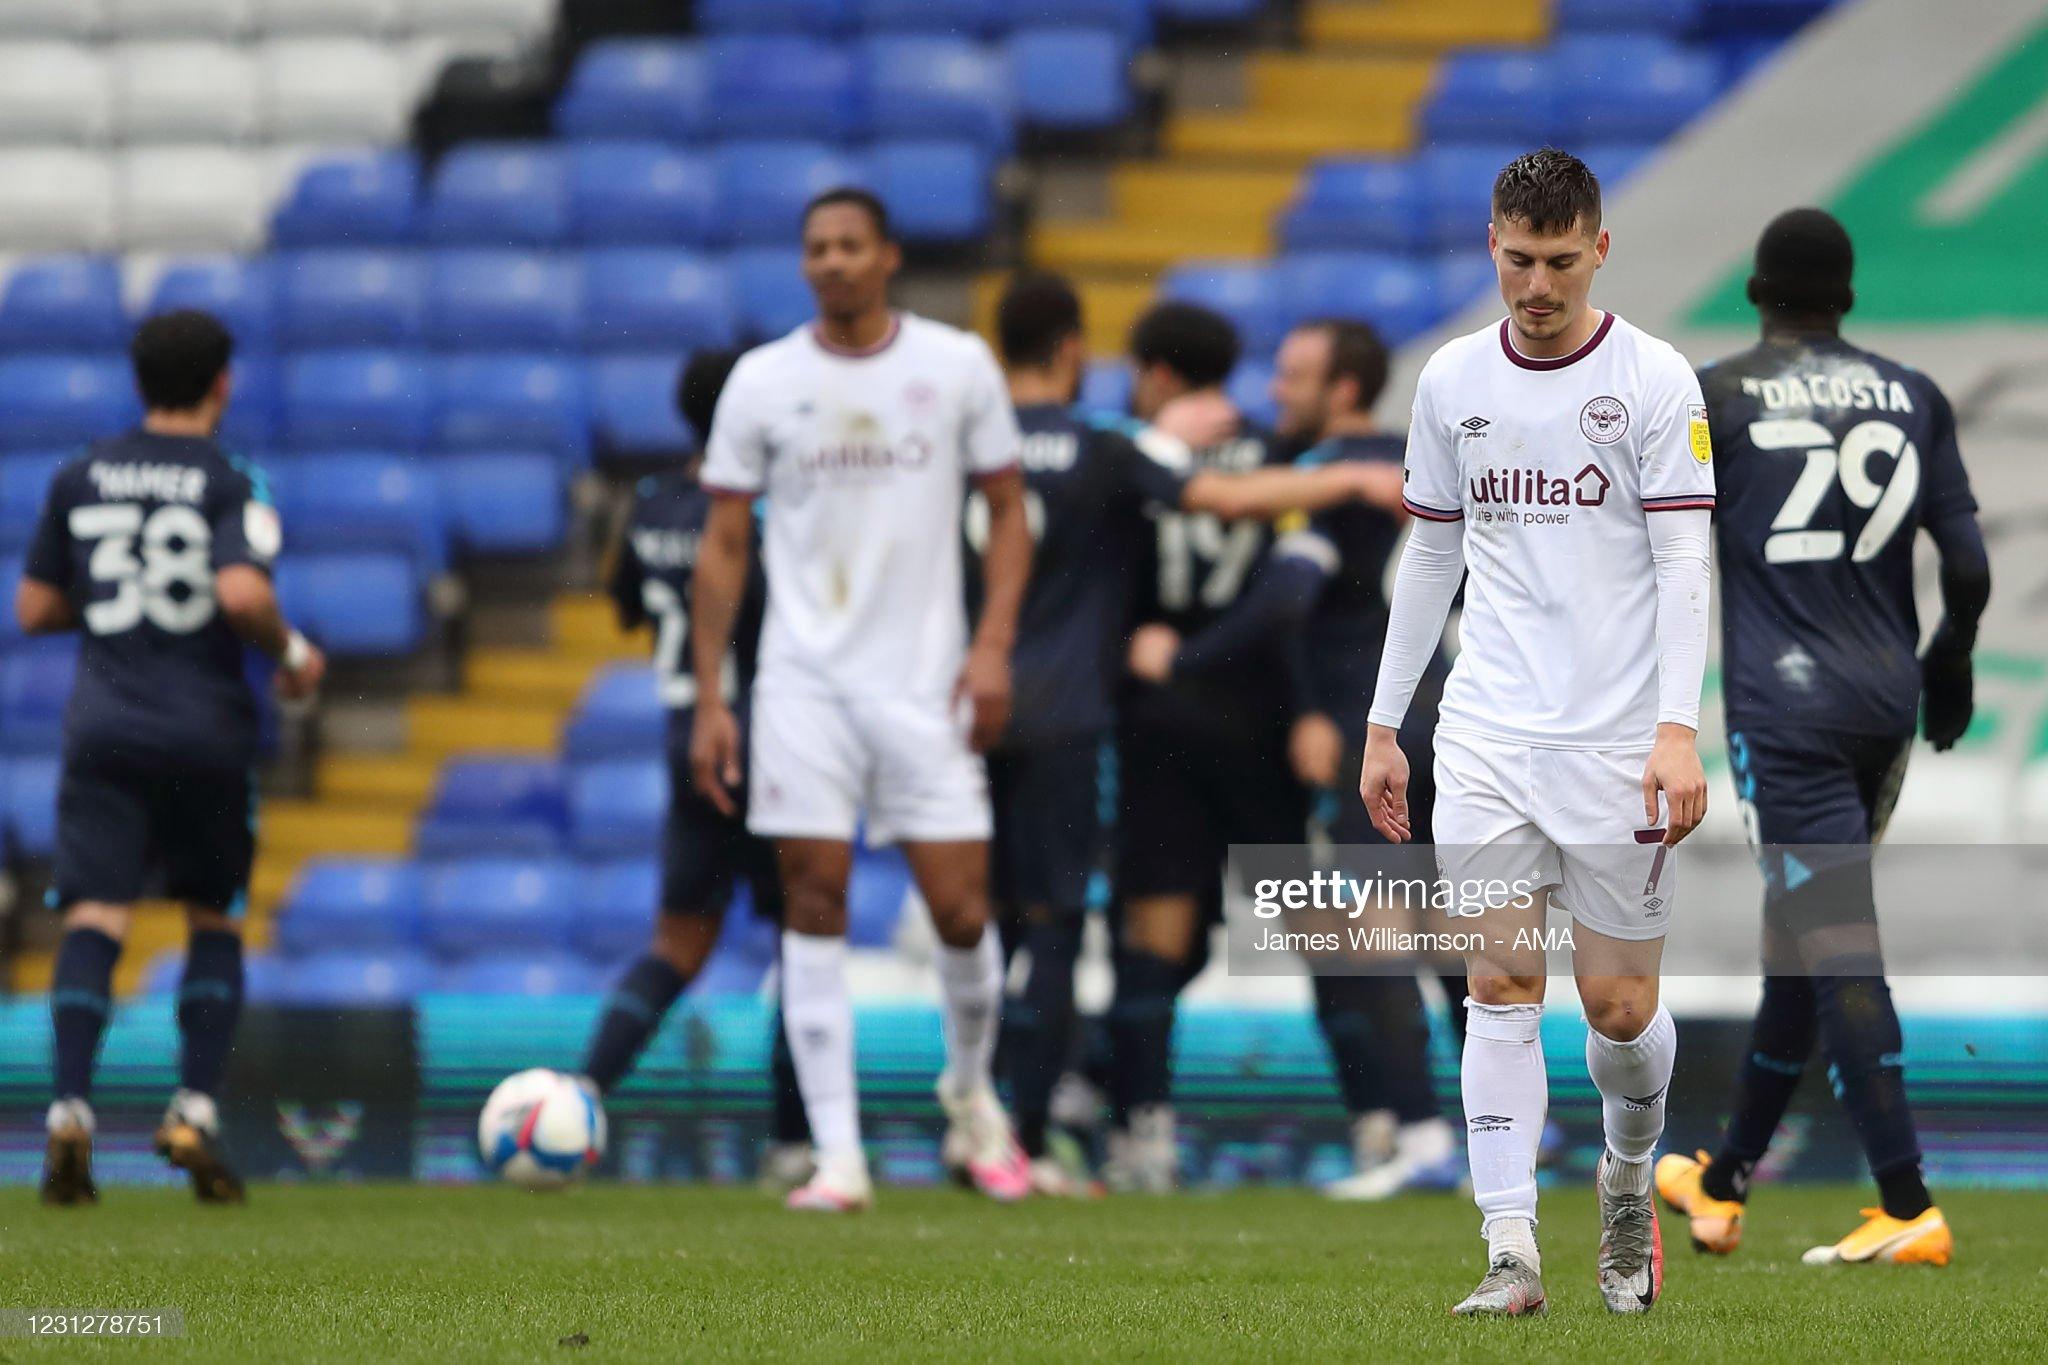 Stuttering Brentford suffer third successive defeat